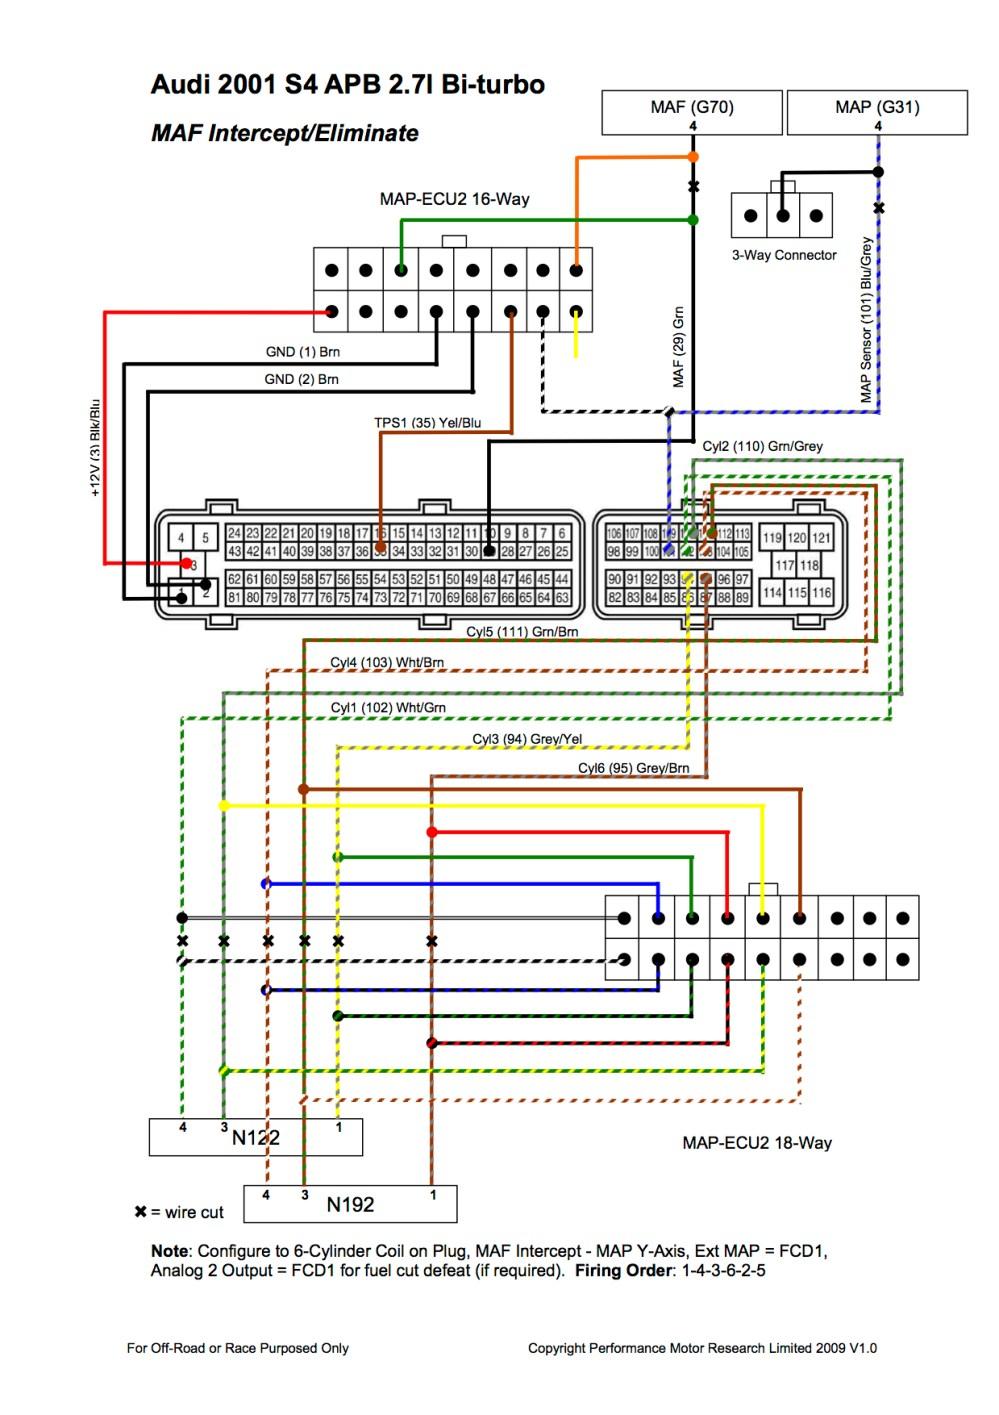 medium resolution of chrysler 300 wiring diagram furthermore chrysler new yorker wiring